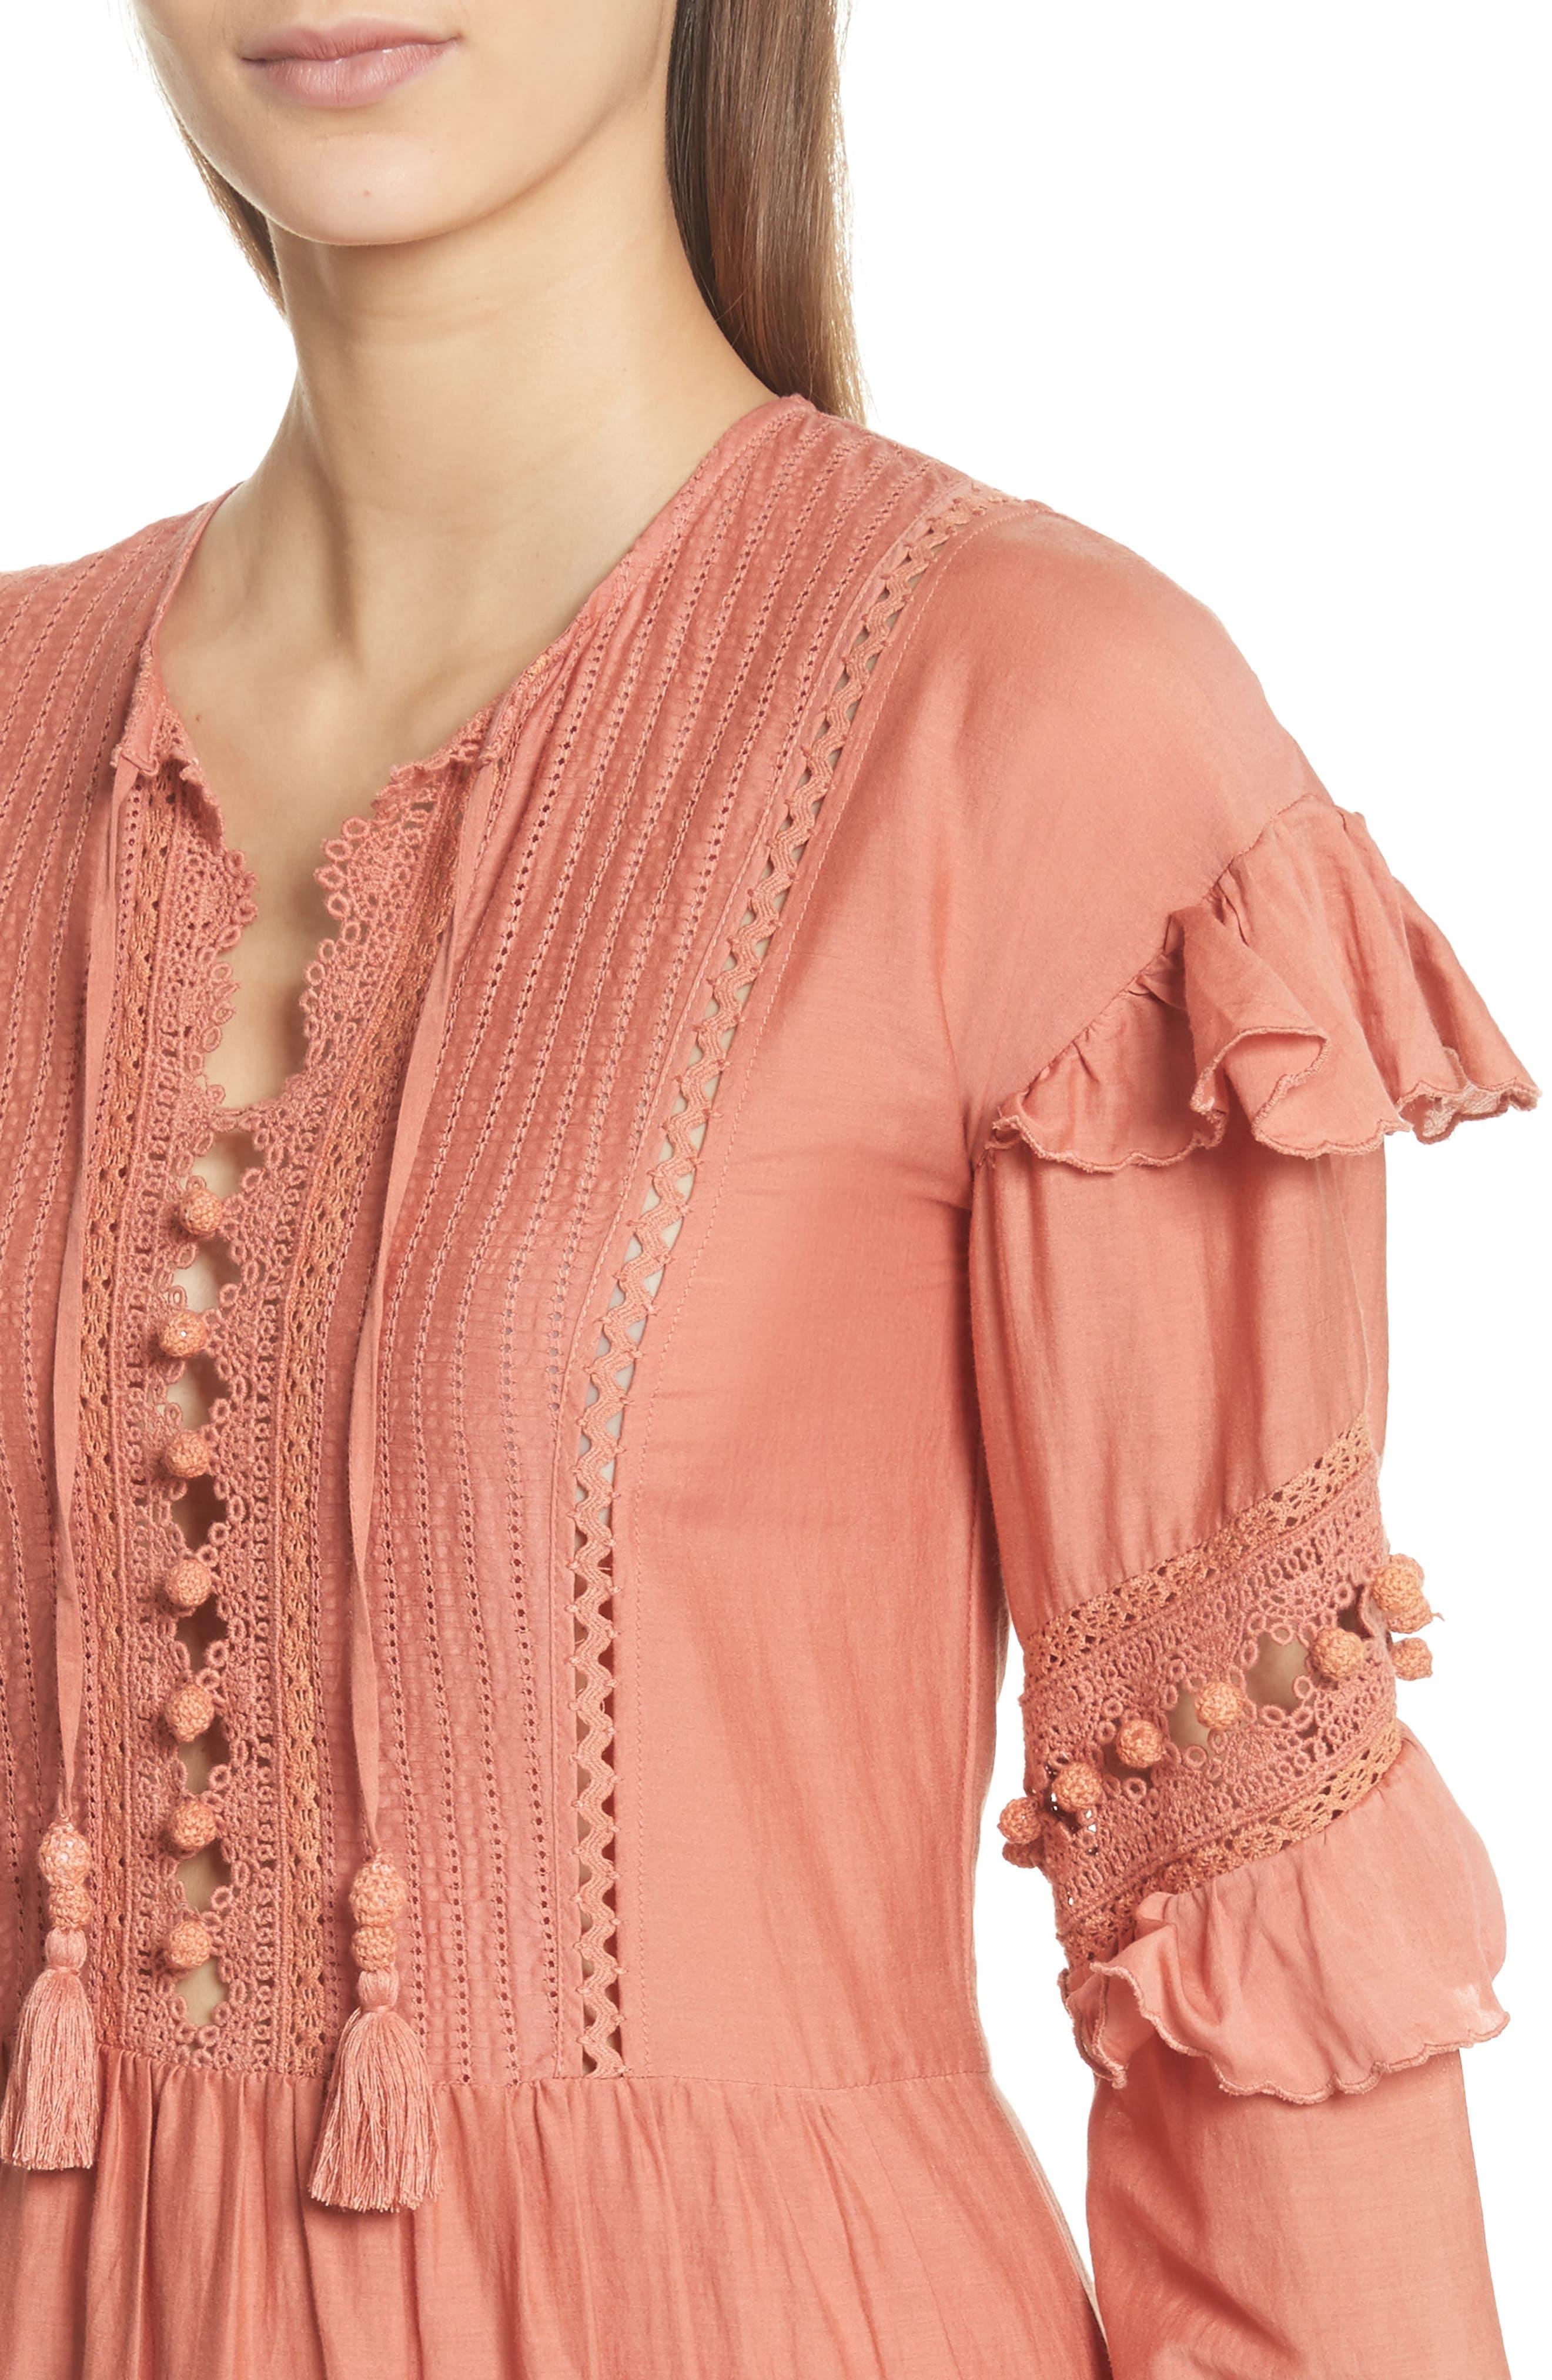 Weatherly Crochet Pompom Dress,                             Alternate thumbnail 4, color,